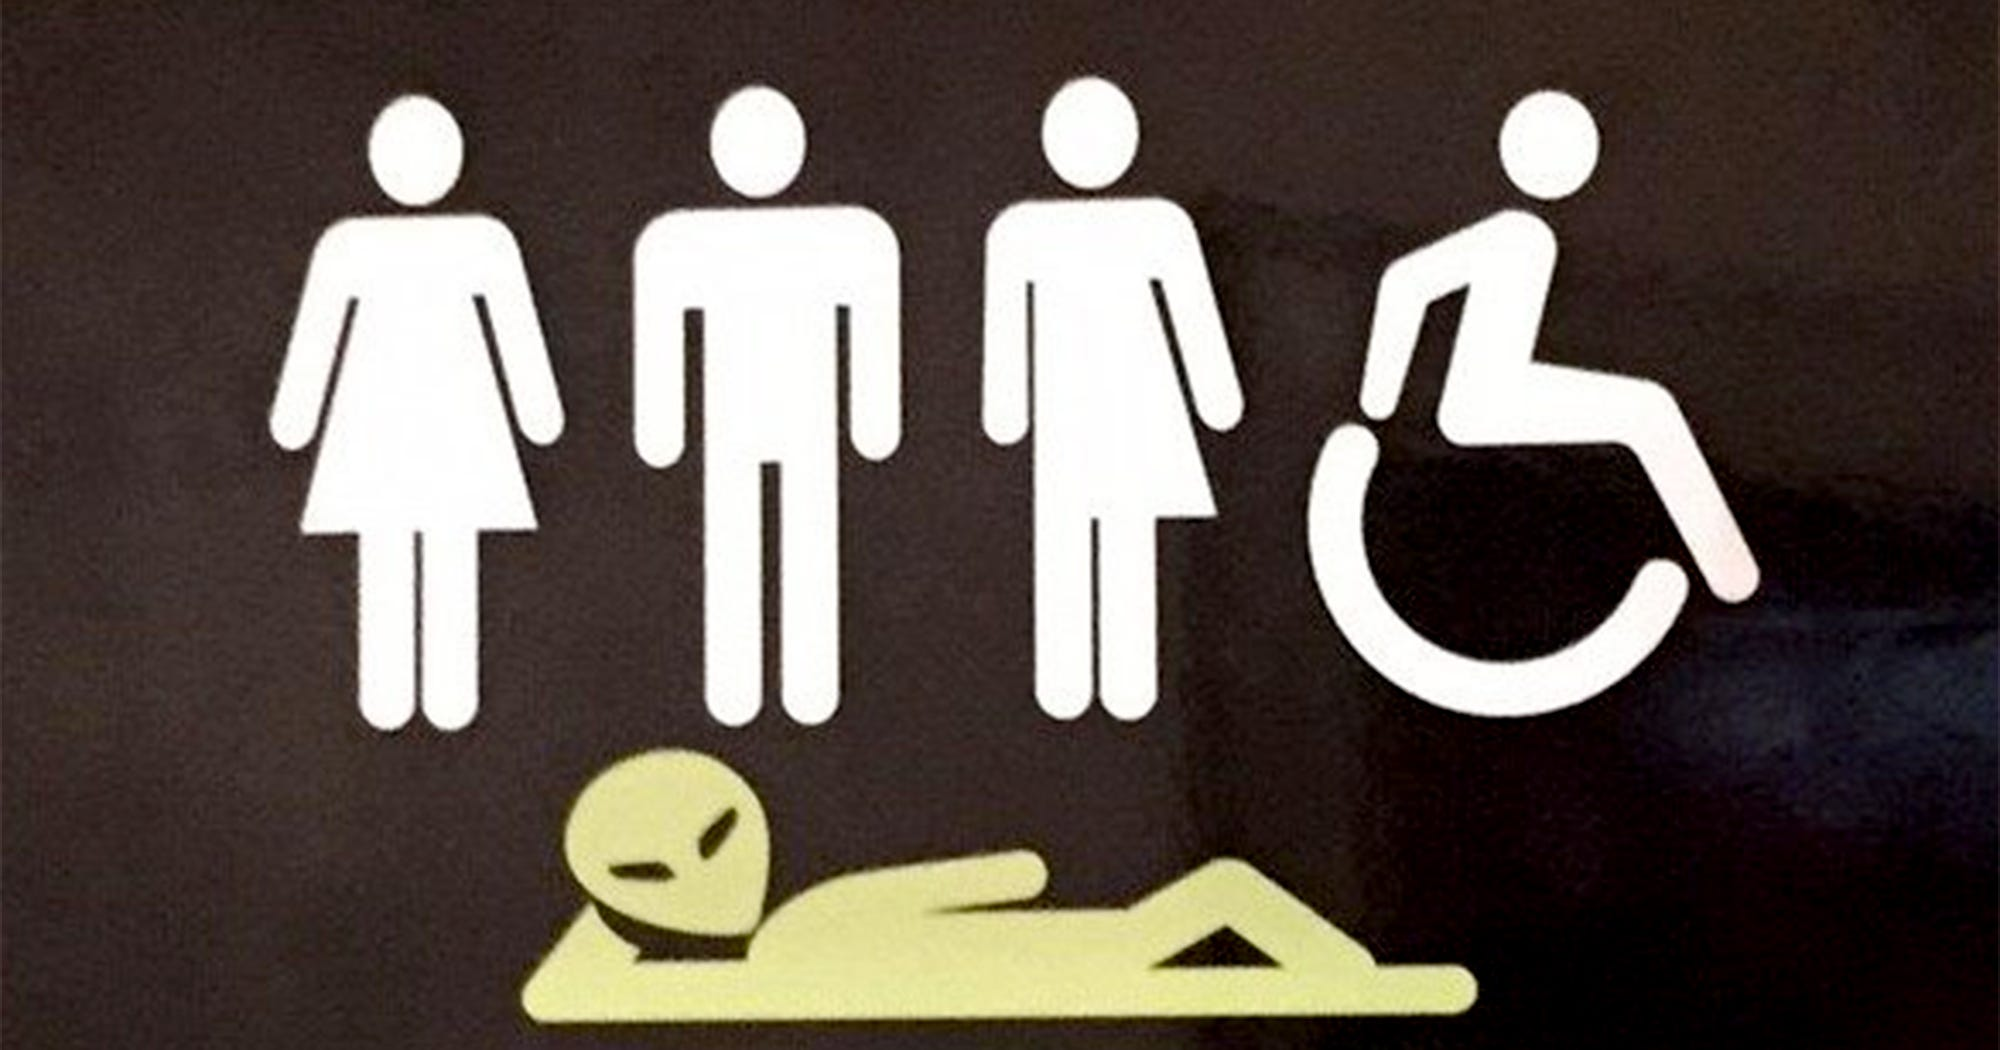 Inclusive Bathroom Sign Public Restroom All Genders